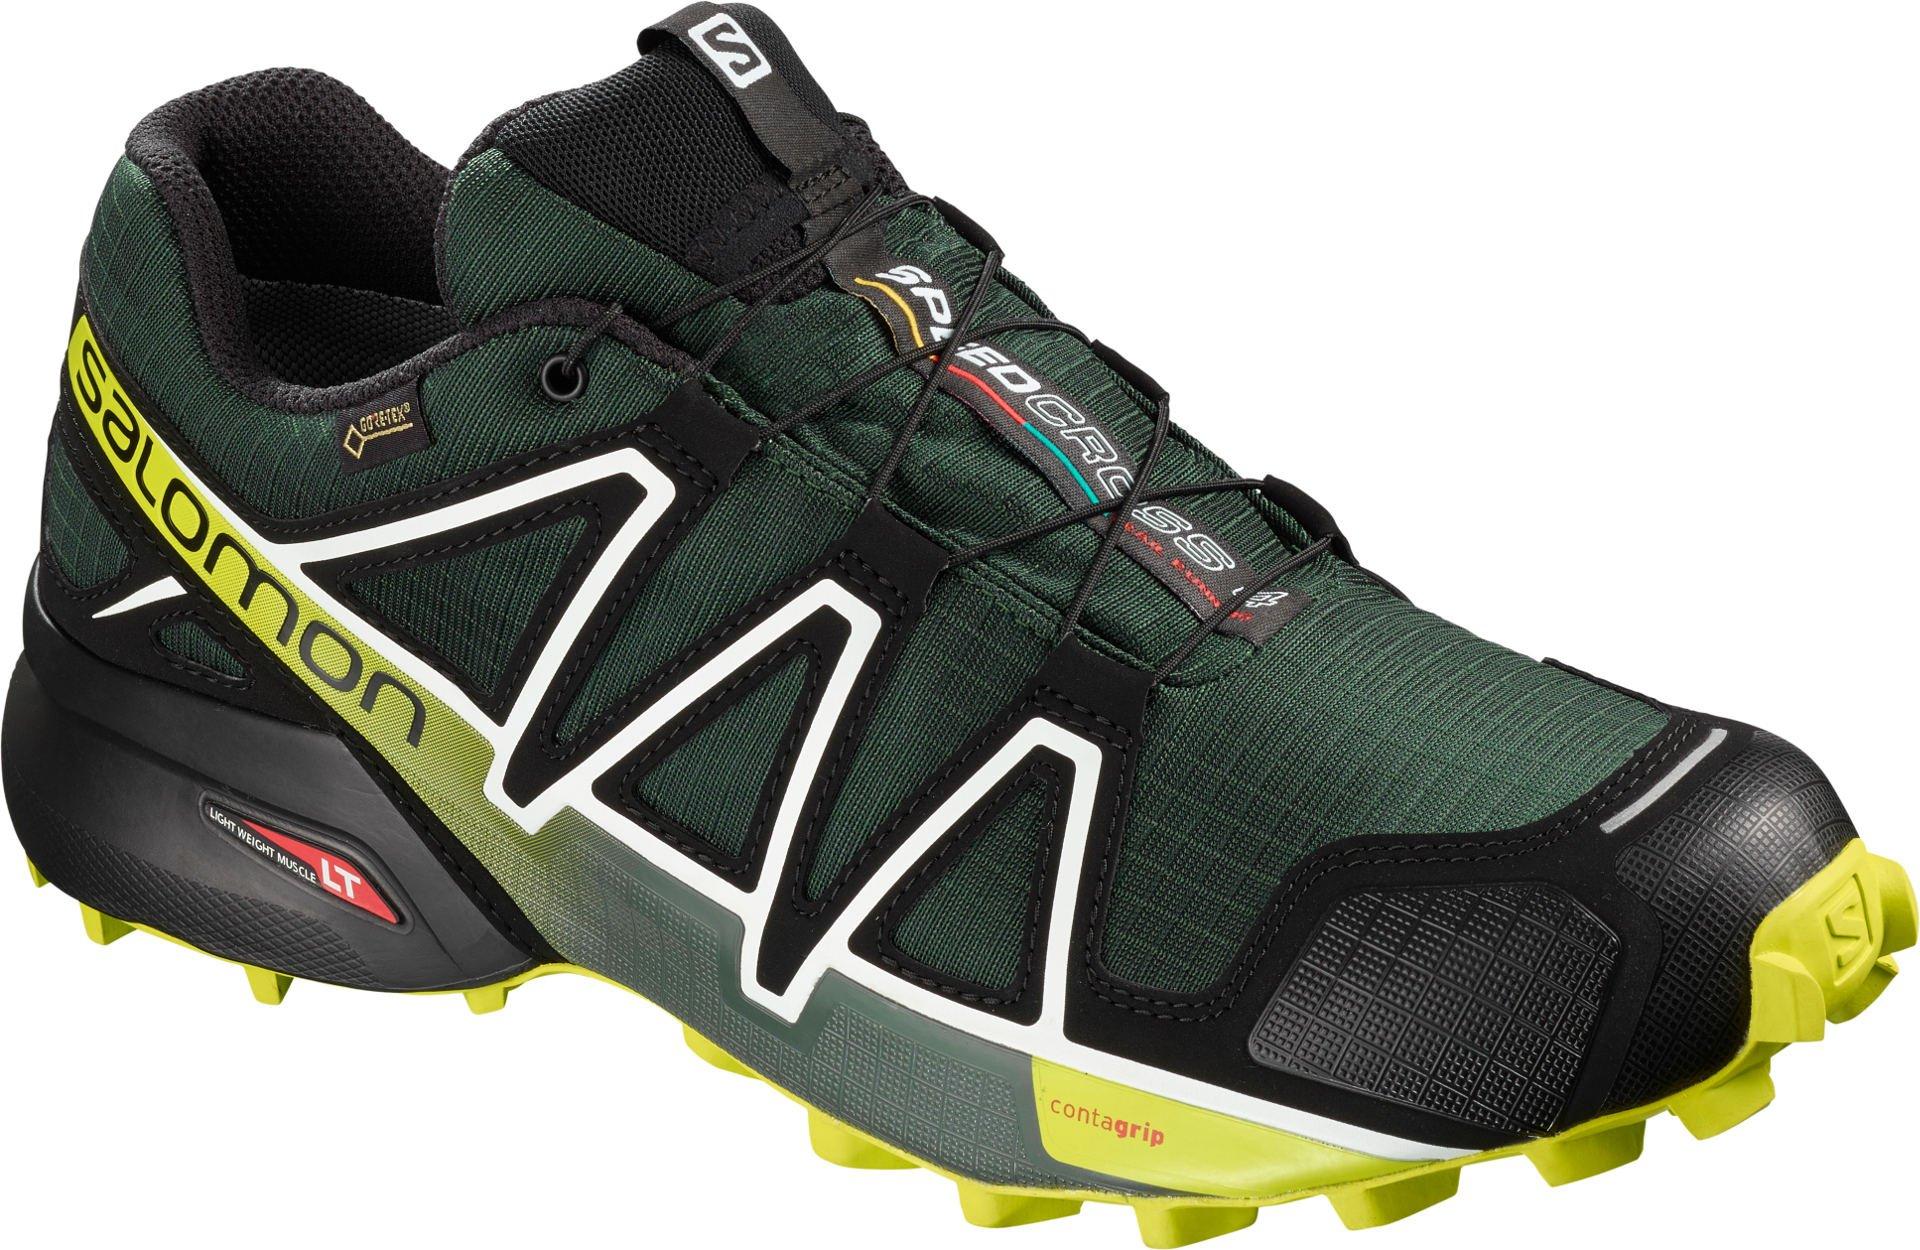 Trailové topánky Salomon SPEEDCROSS 4 GTX Darkest Sp Bk Aci ... 2060f5064b3